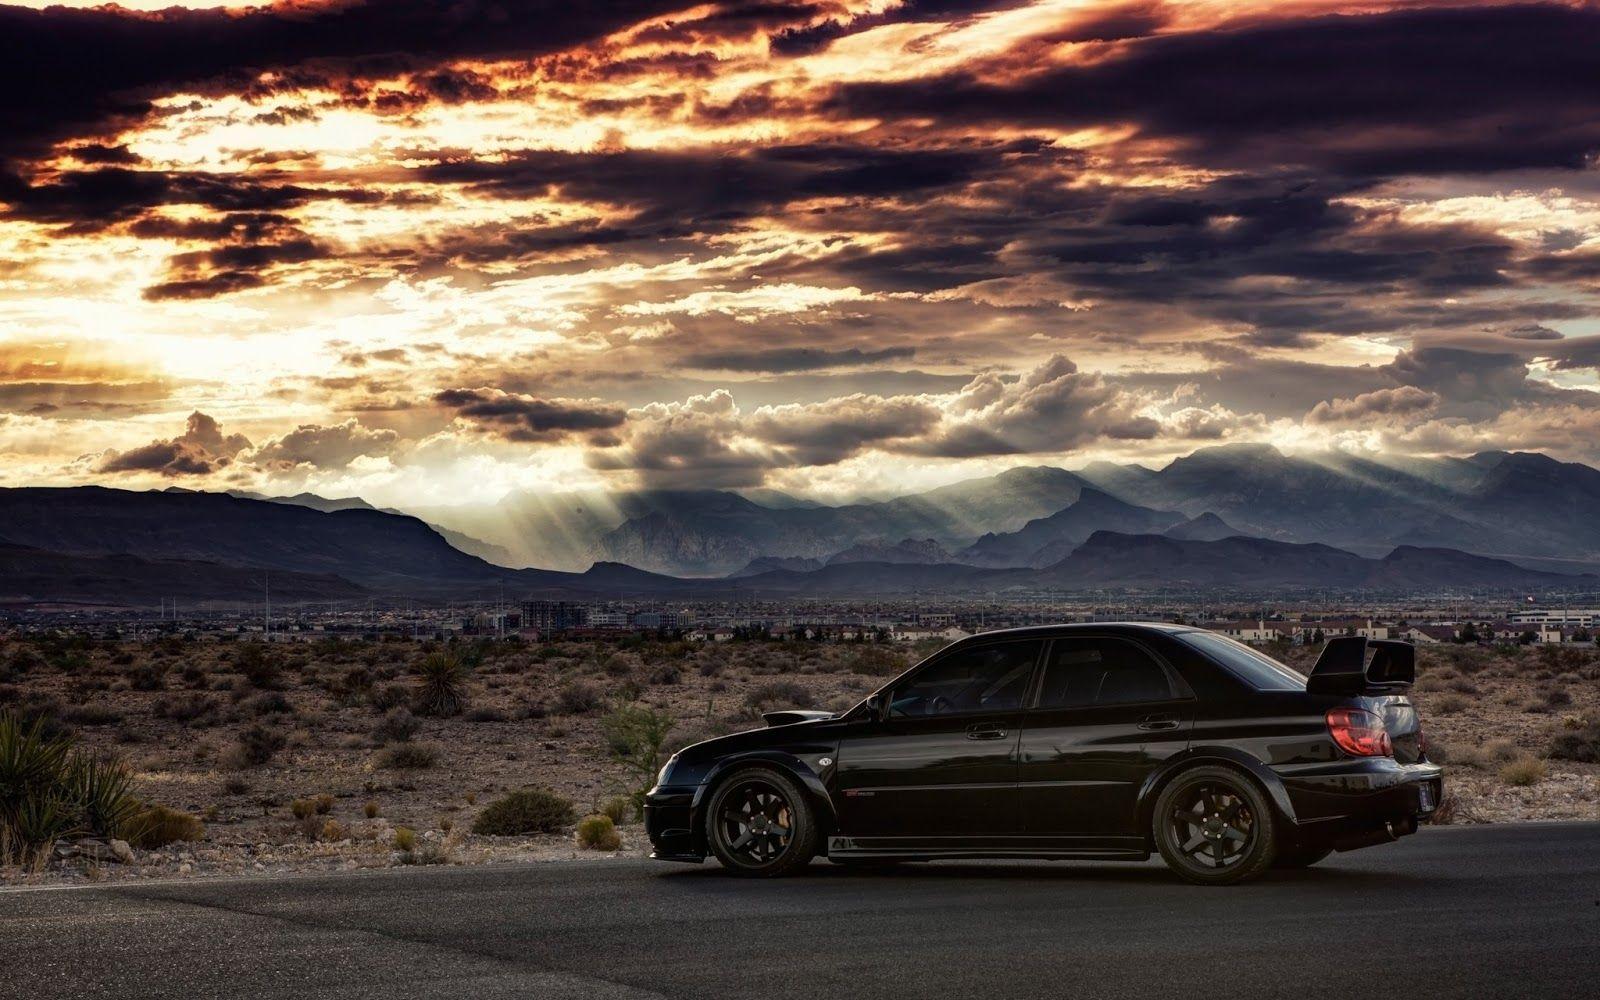 Subaru Impreza WRX STI Car Wallpaper HD